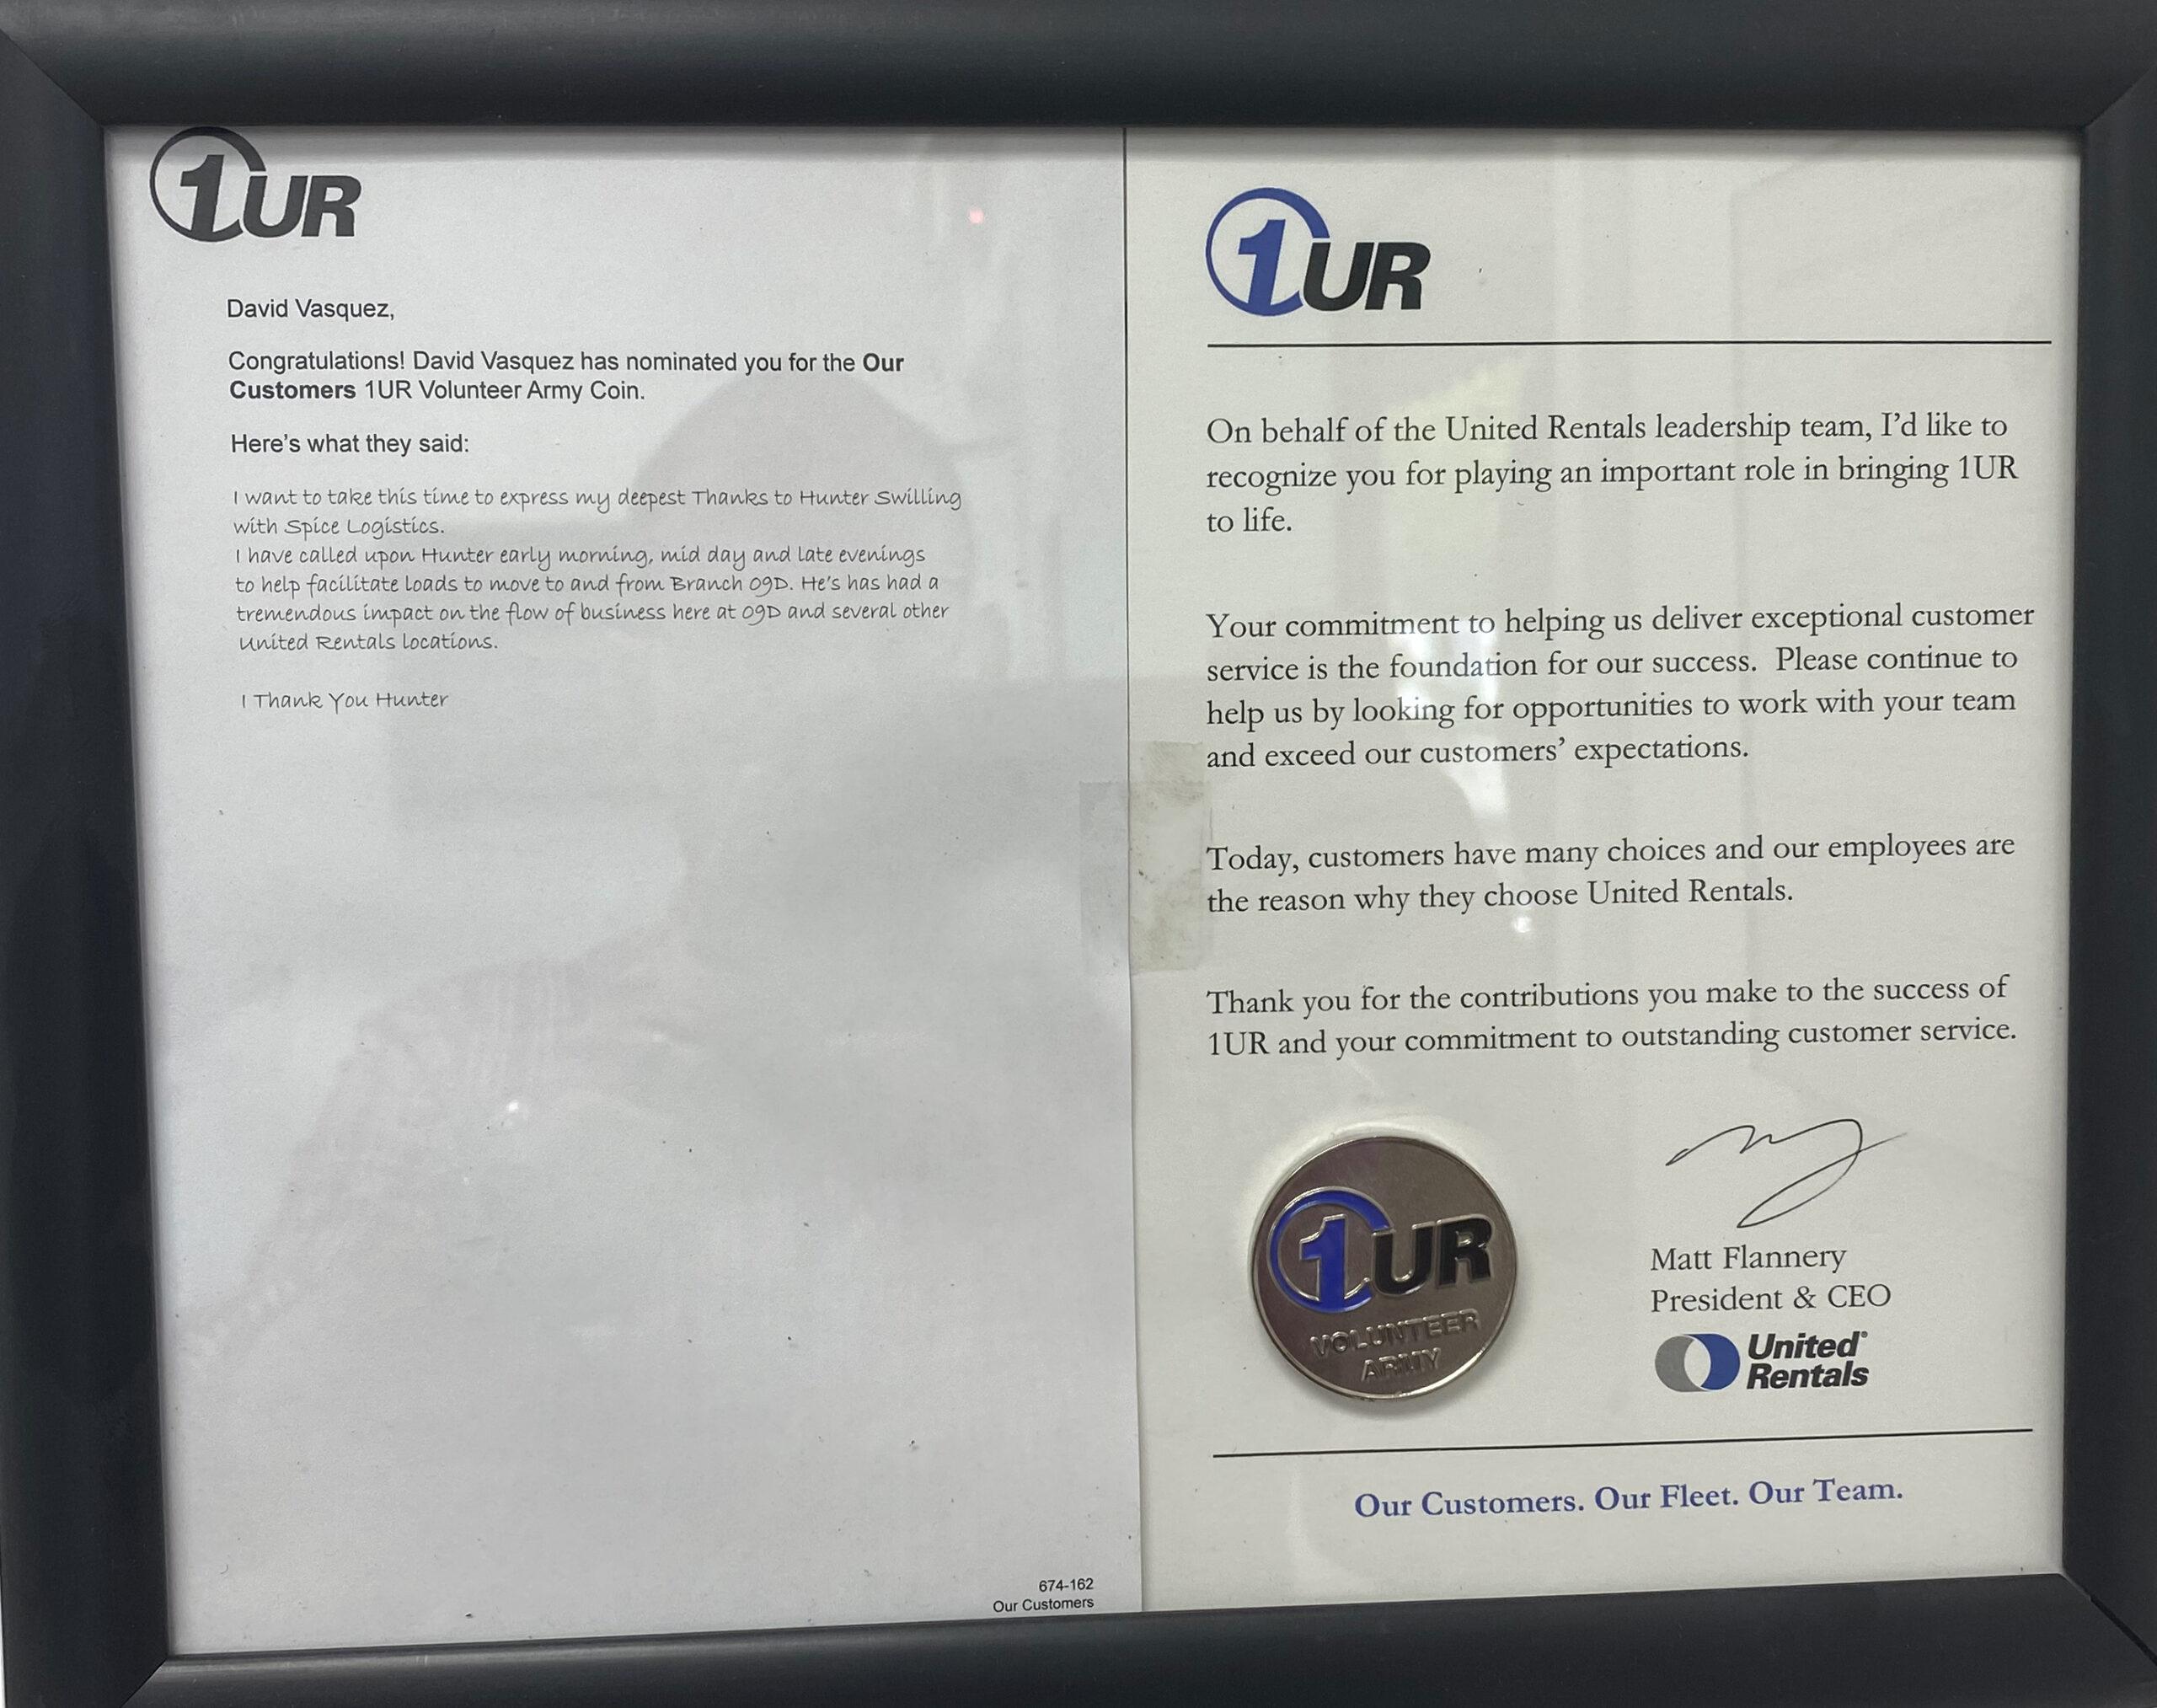 1UR Award